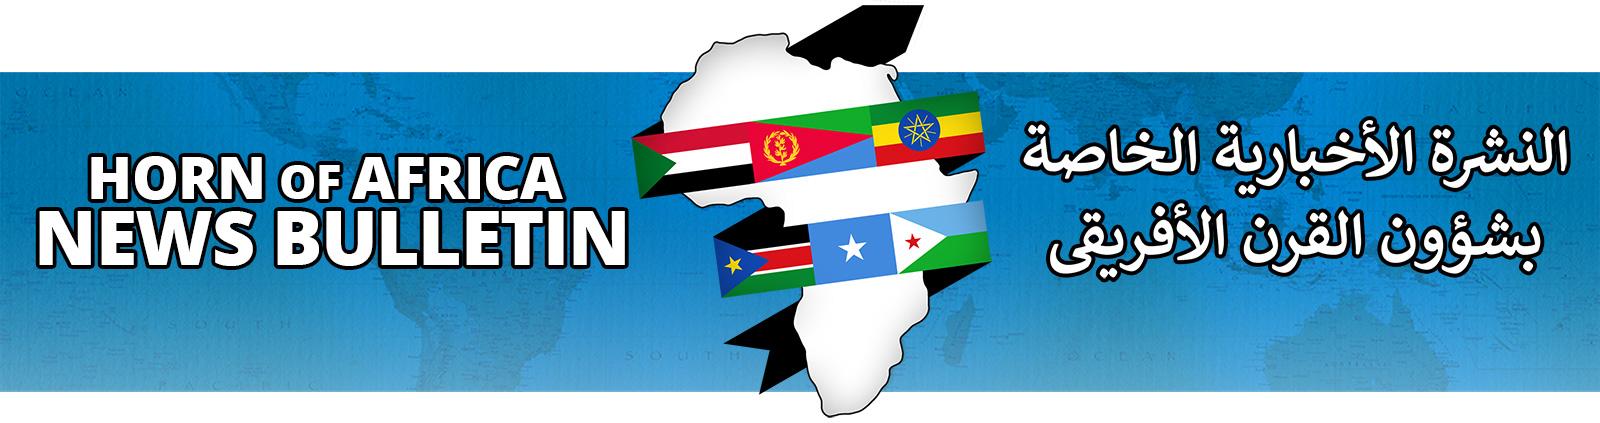 Horn of Africa - News Bulletin